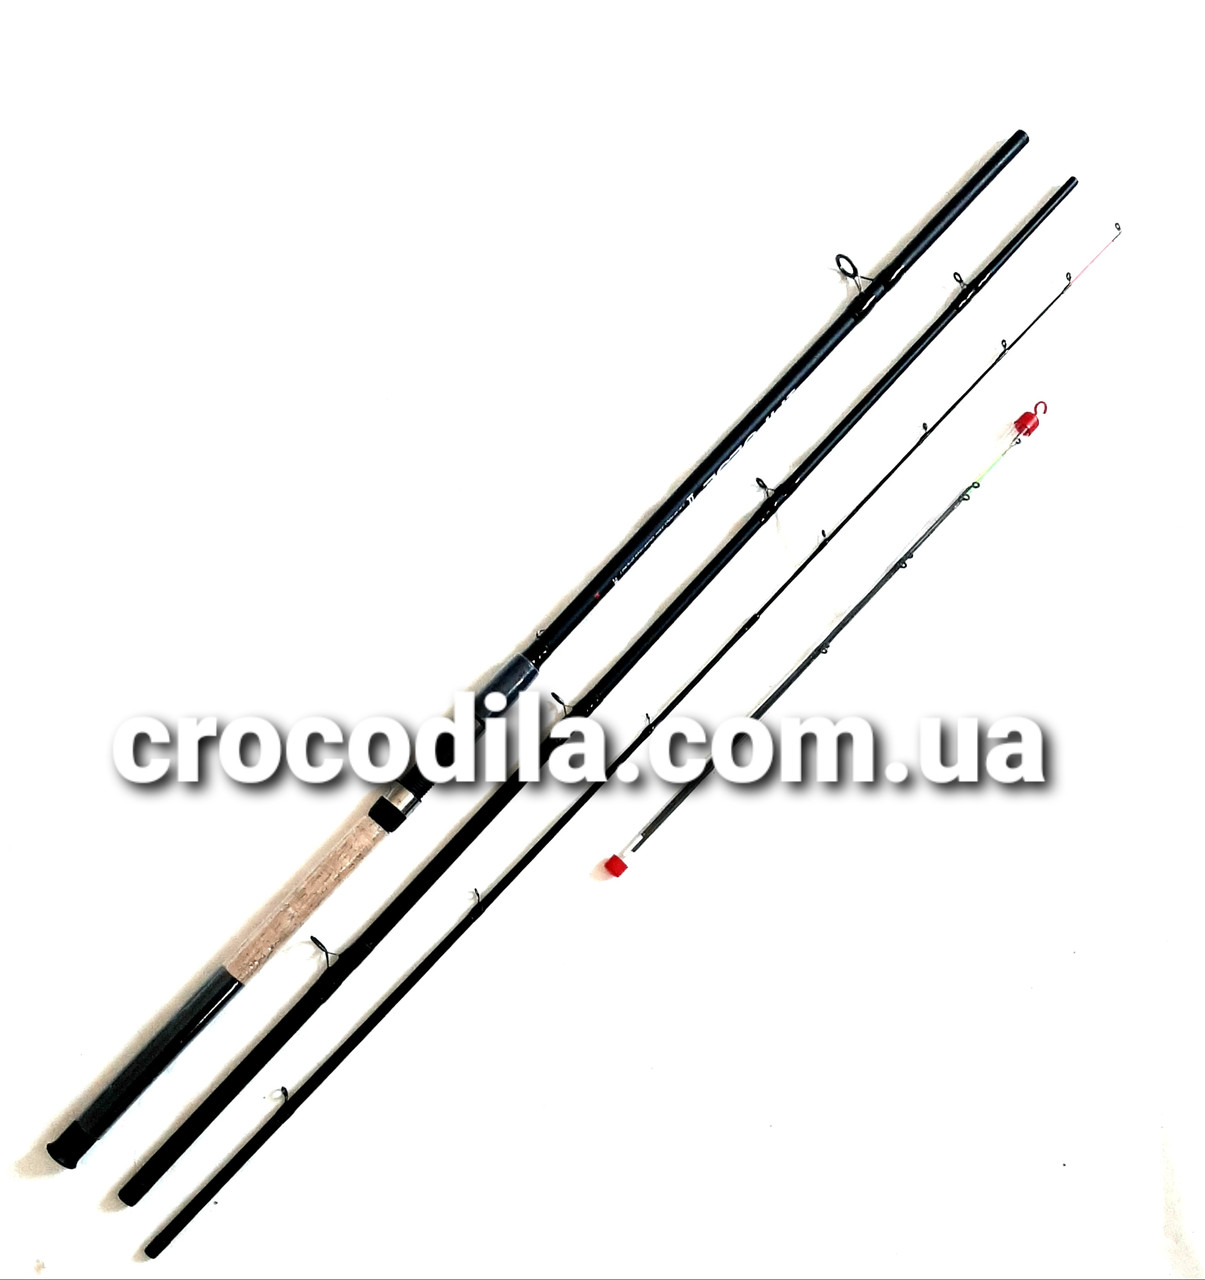 Фидерное удилище Kaida (Weida) Impulse II 3.3 m 60-160